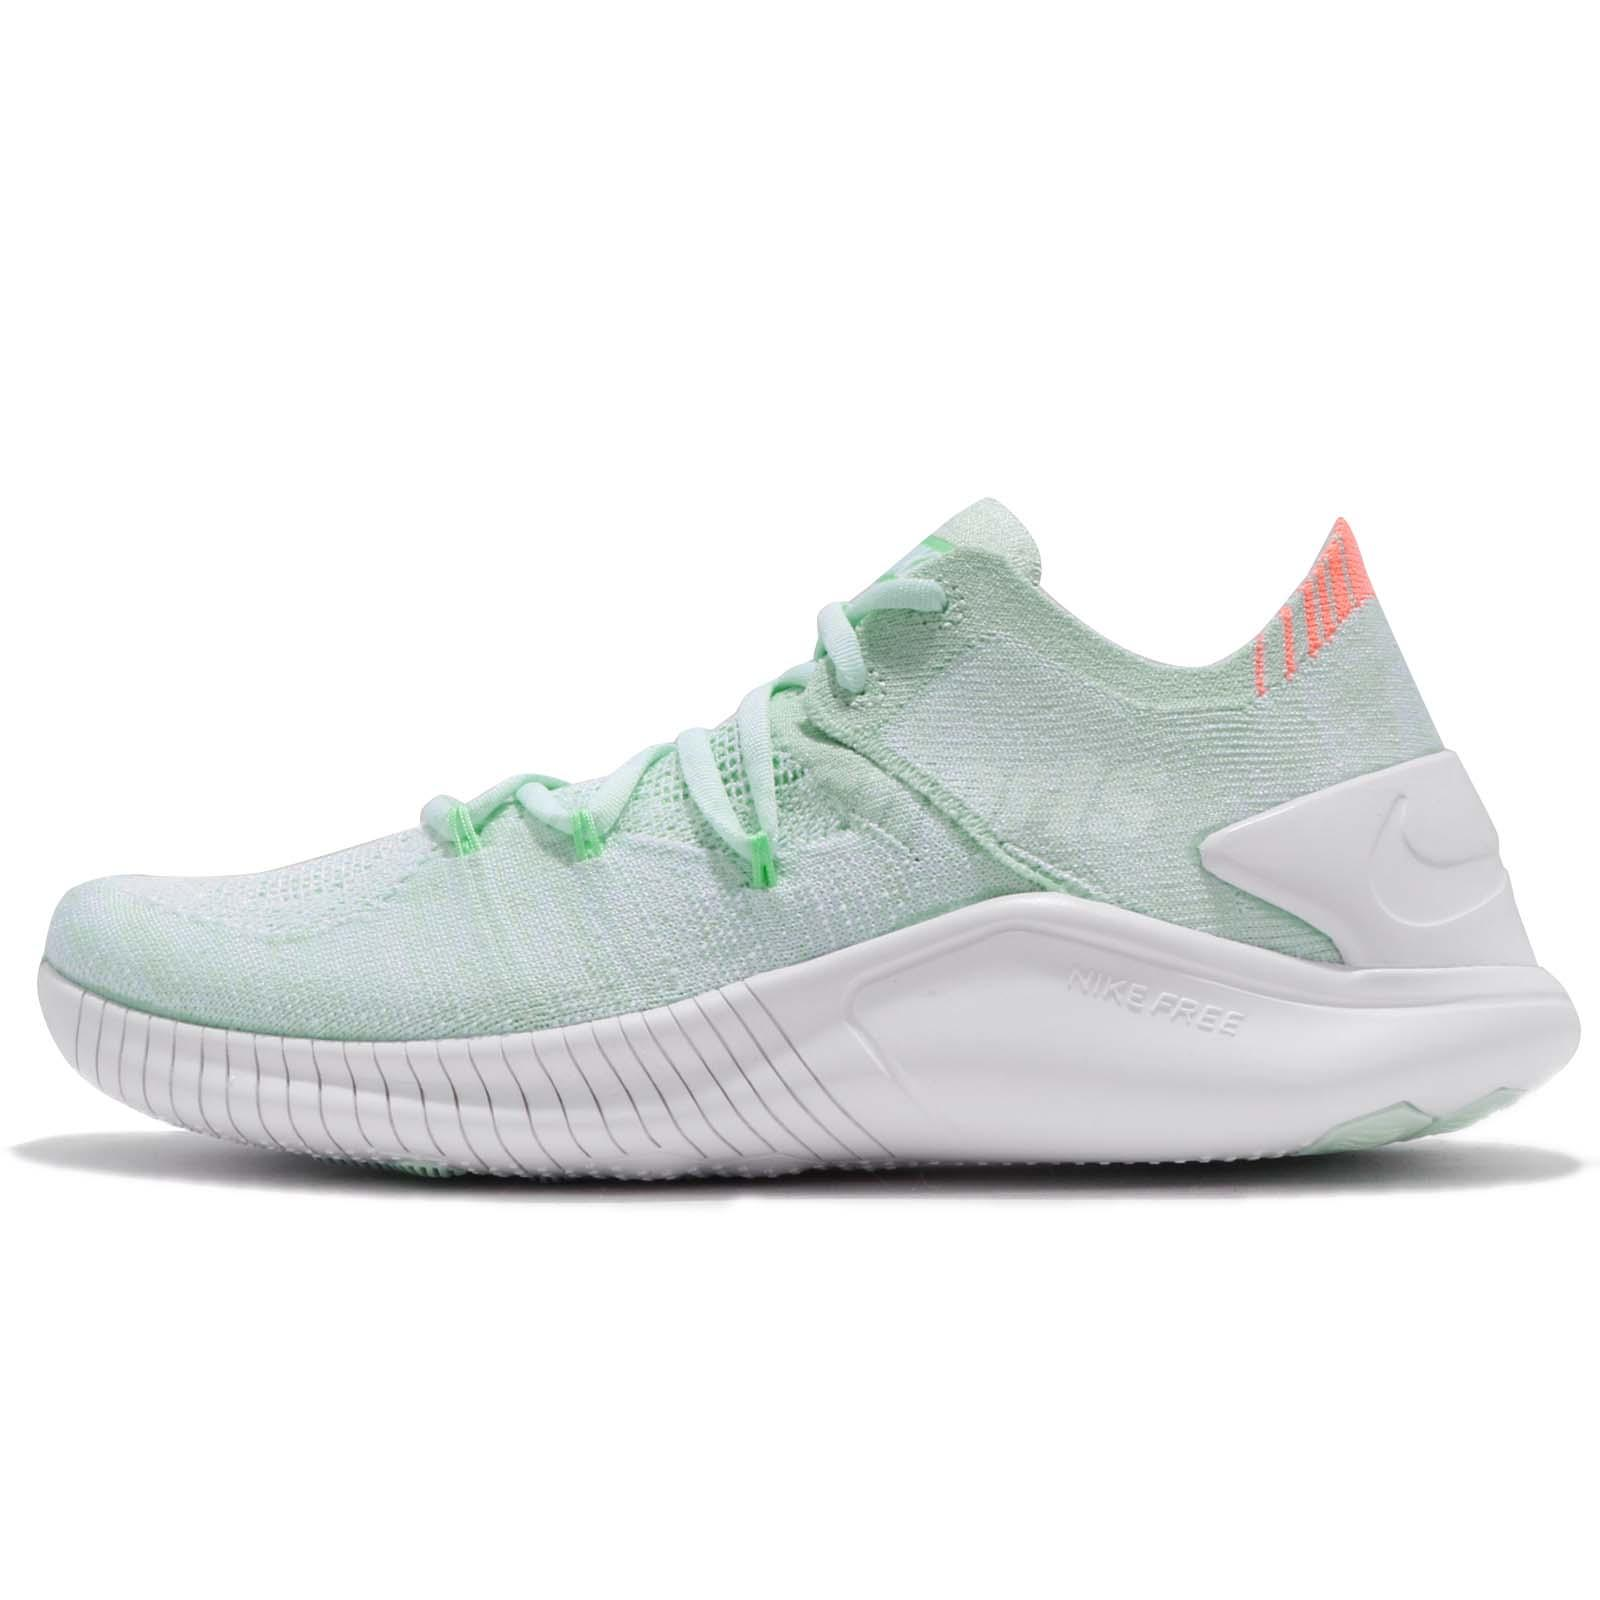 f758ded902434 Nike Wmns Free TR Flyknit 3 Igloo Green Women Cross Training Shoes 942887- 301